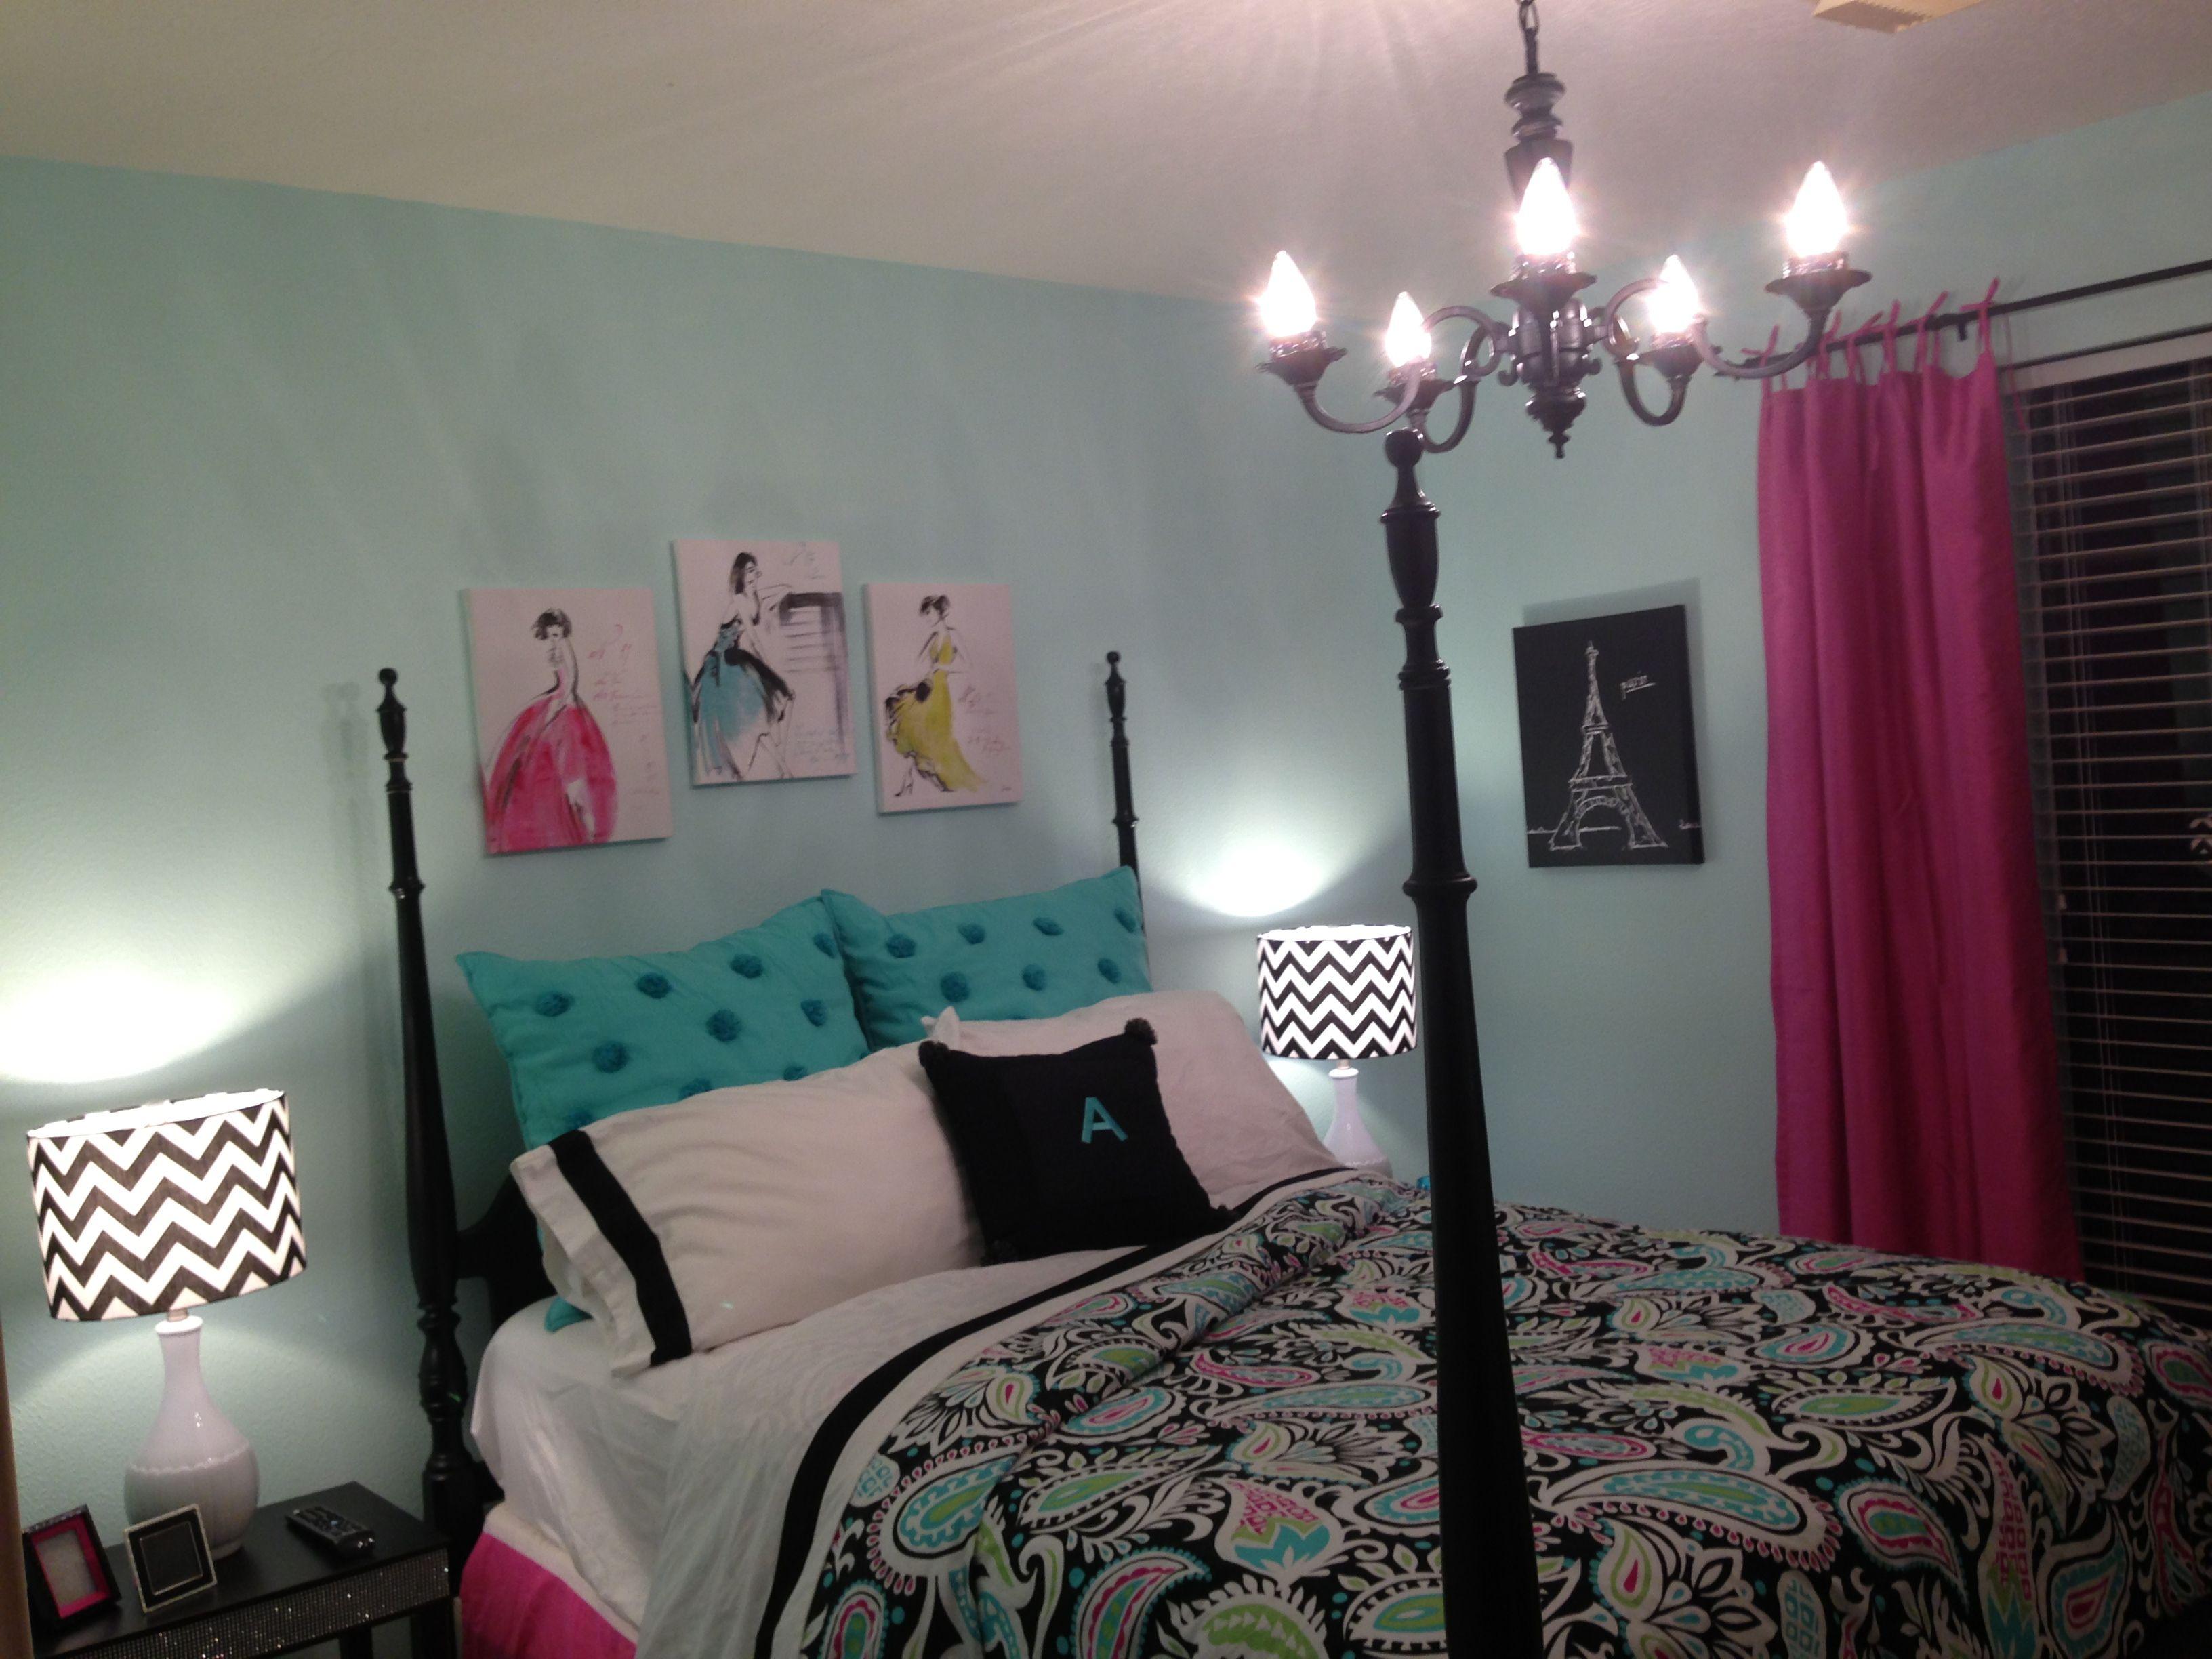 Paisley Bedroom Barely Teal Paint Lola Paisley Pb Teen Home Decor Pinterest